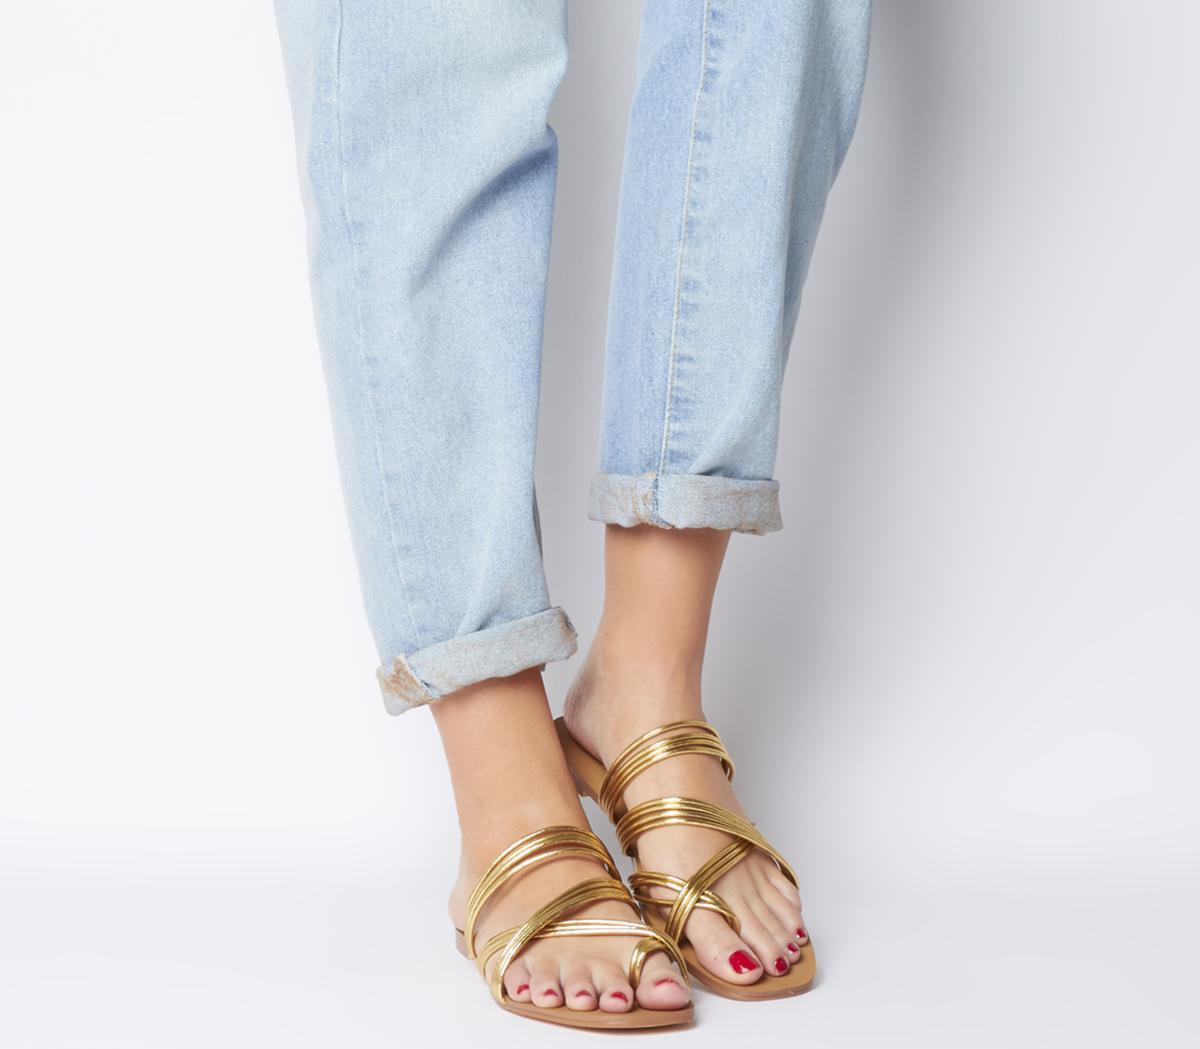 Snazzy Strippy Sandals